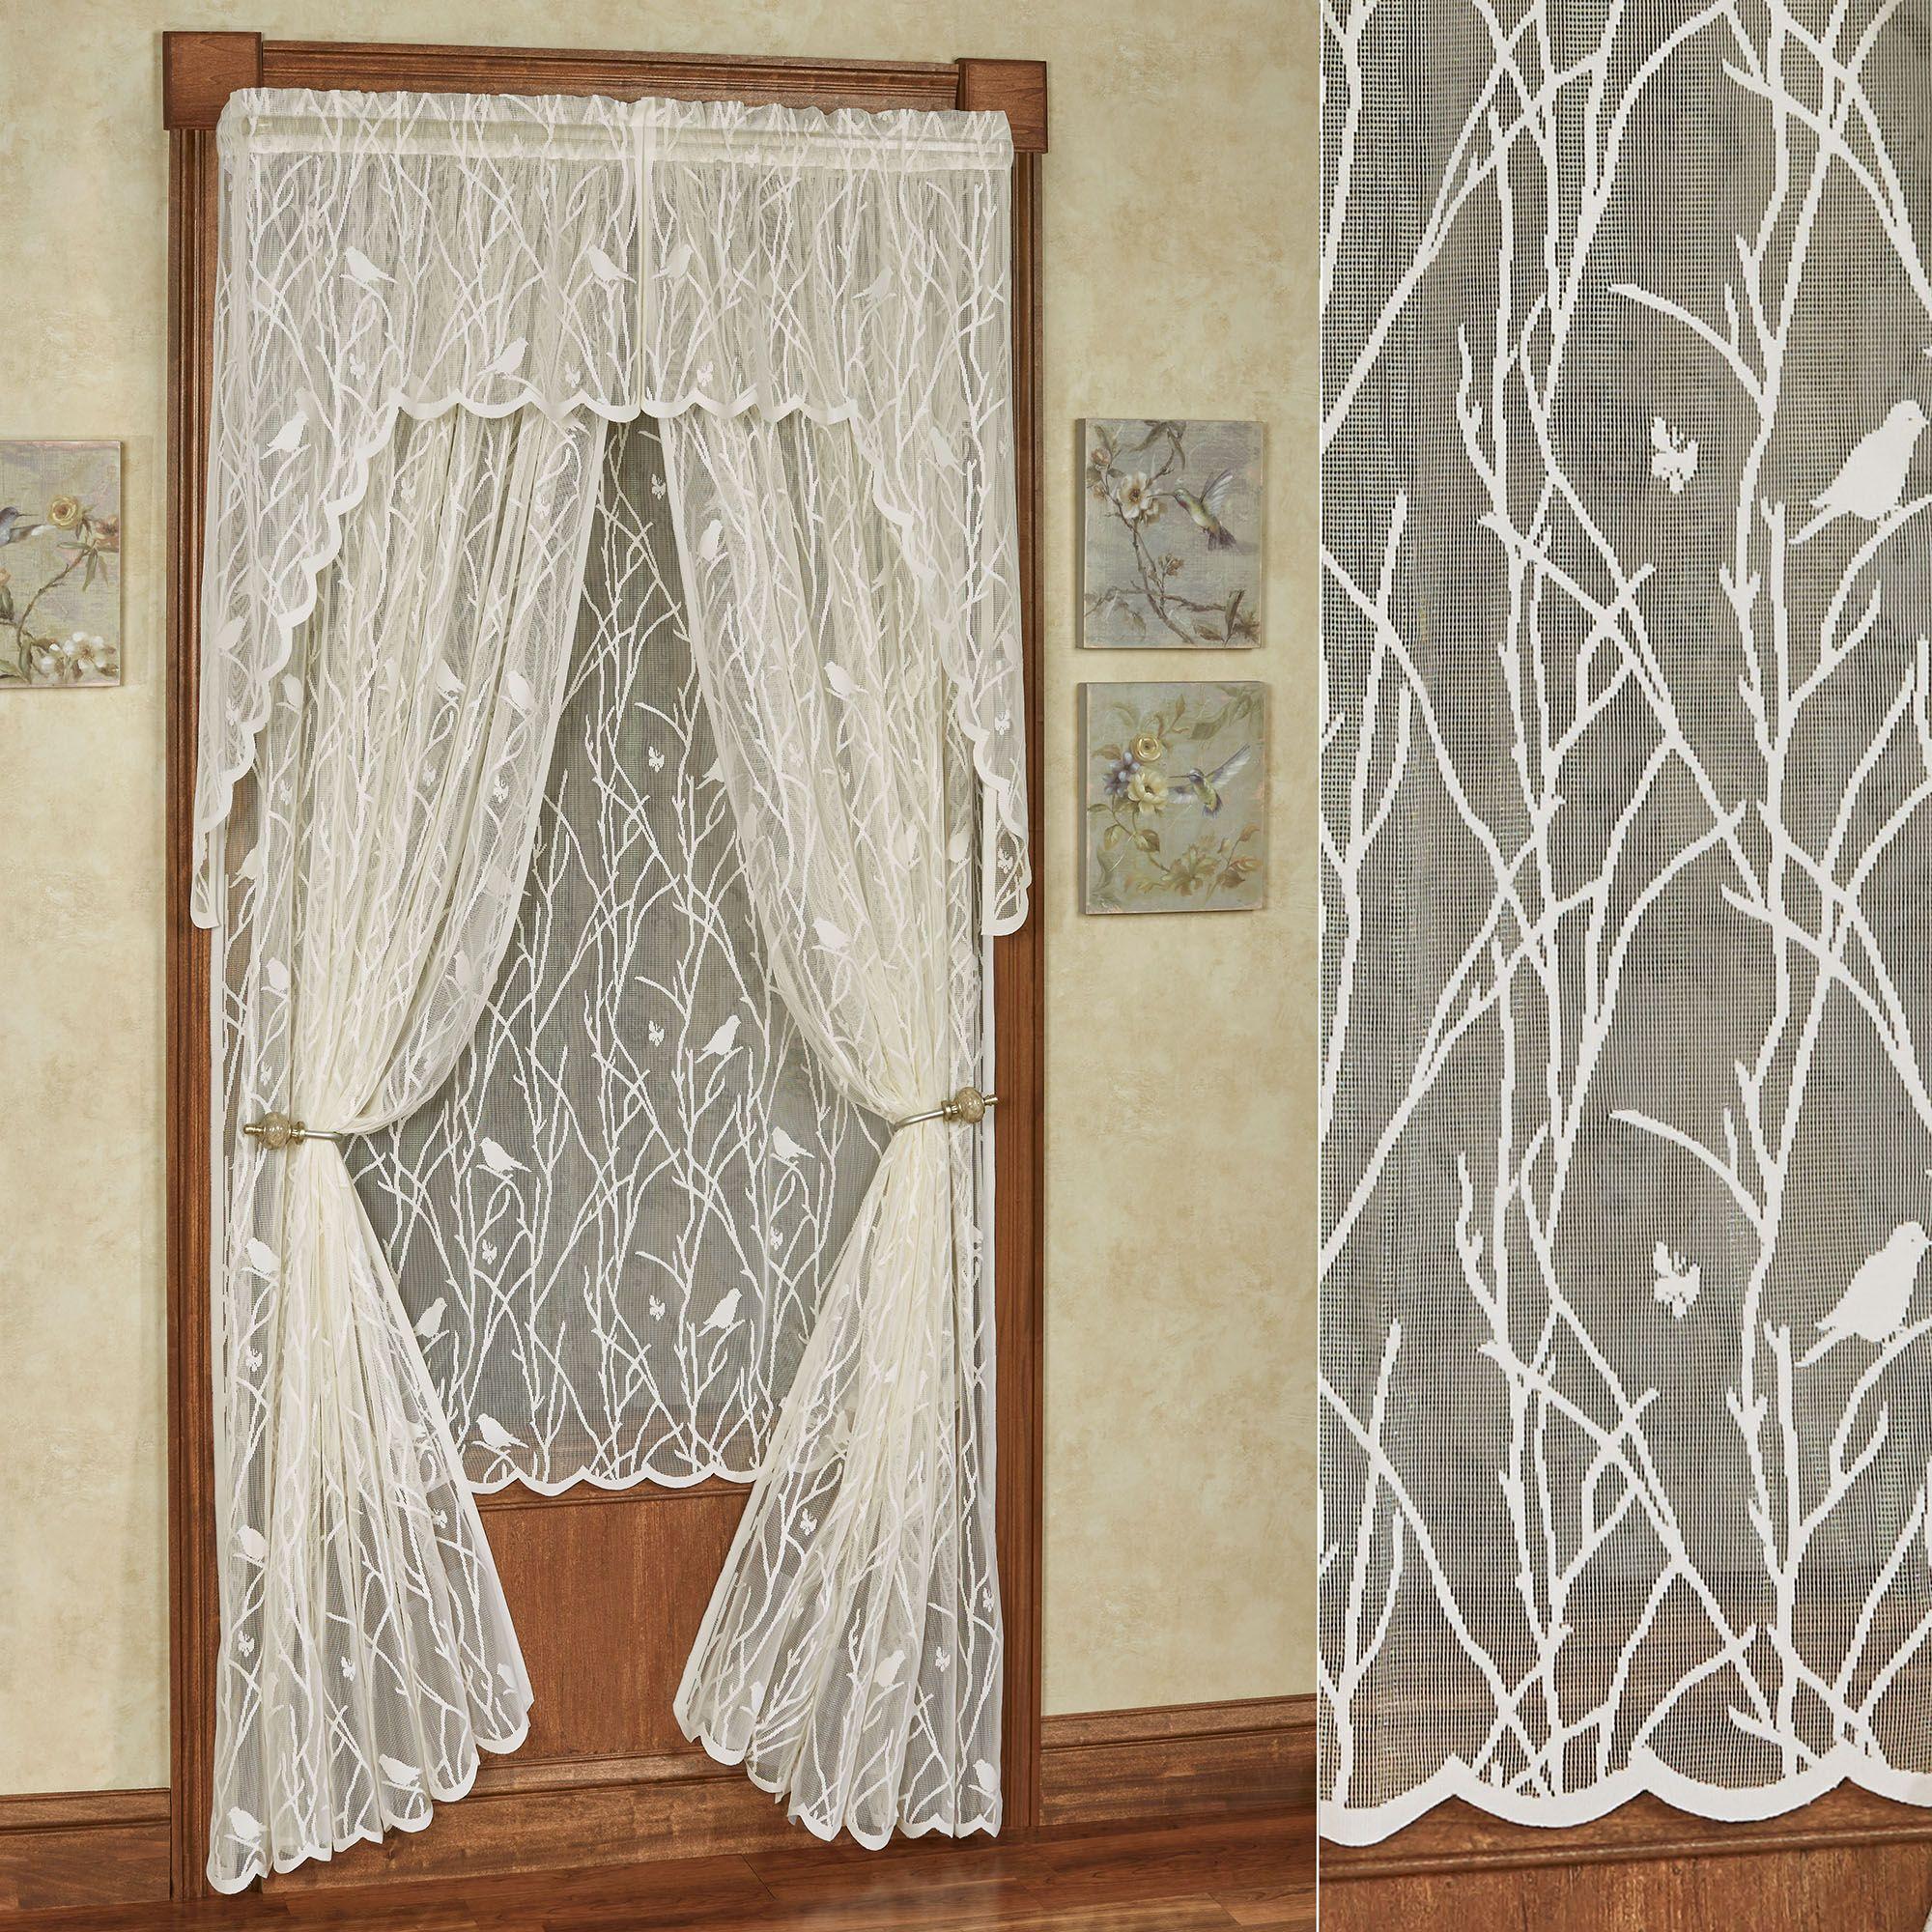 Troubadour Birds Lace Curtain Window Treatment